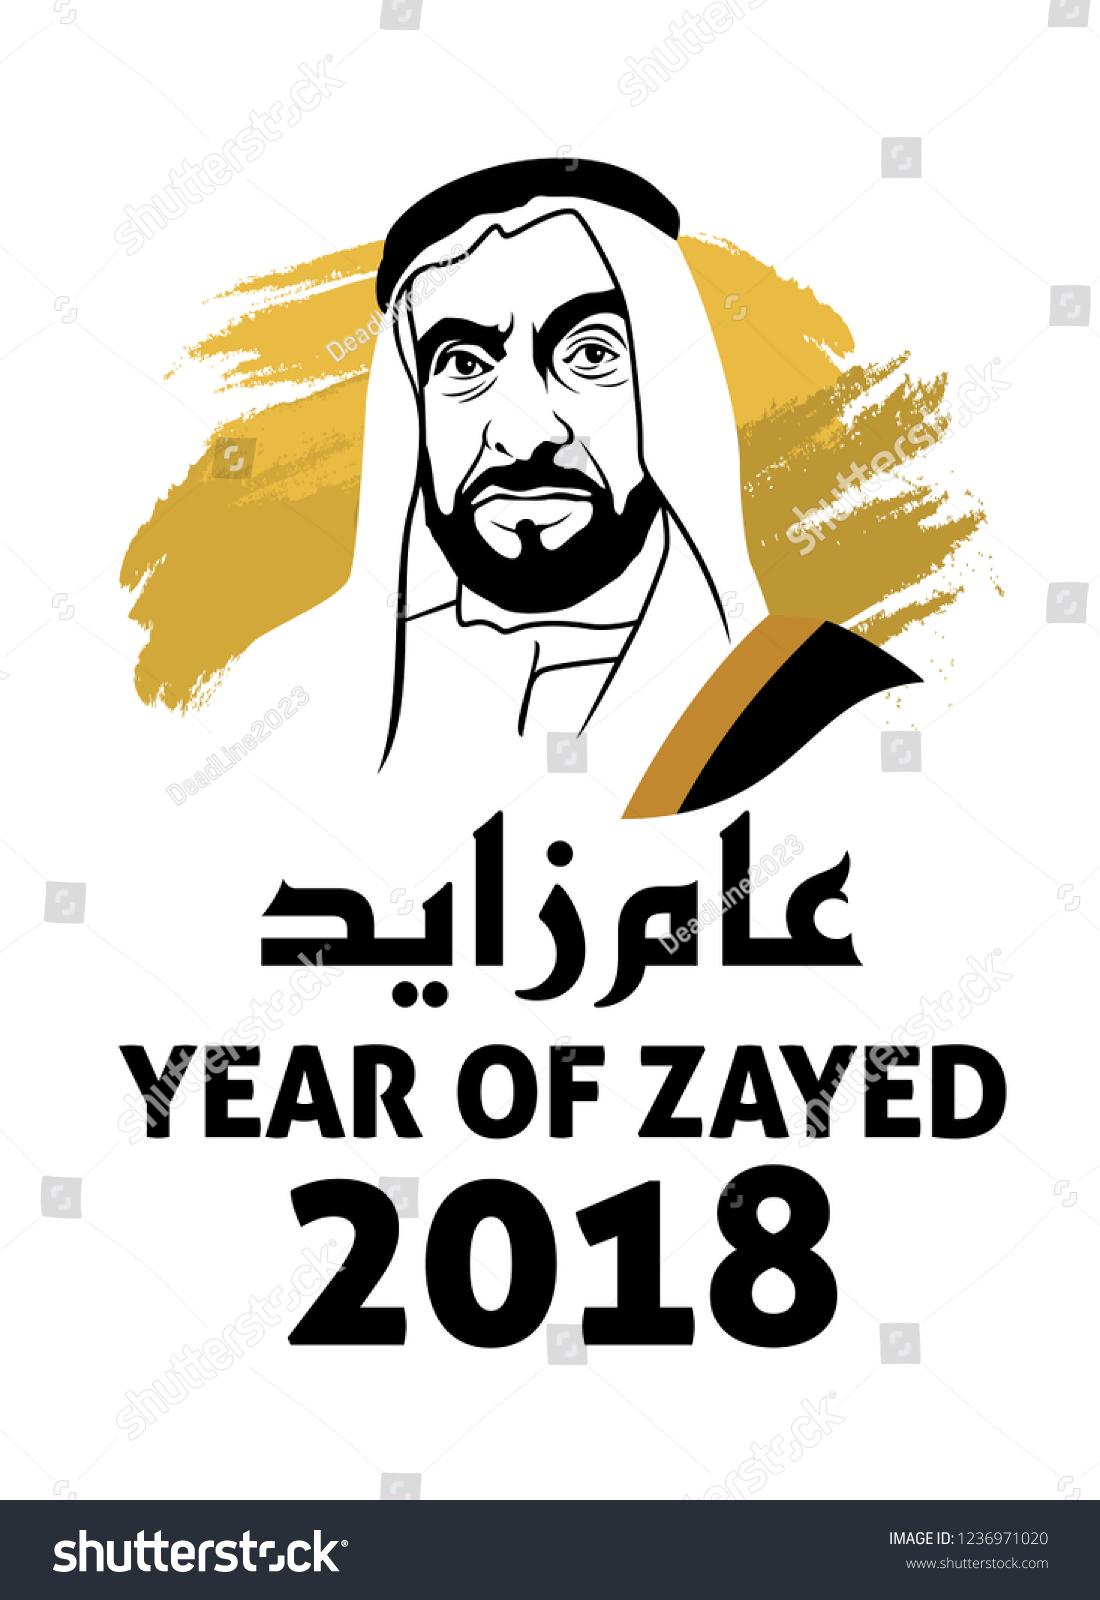 Dubai Uae December 2 2018 Text Stock Vector (Royalty Free) 1236971020